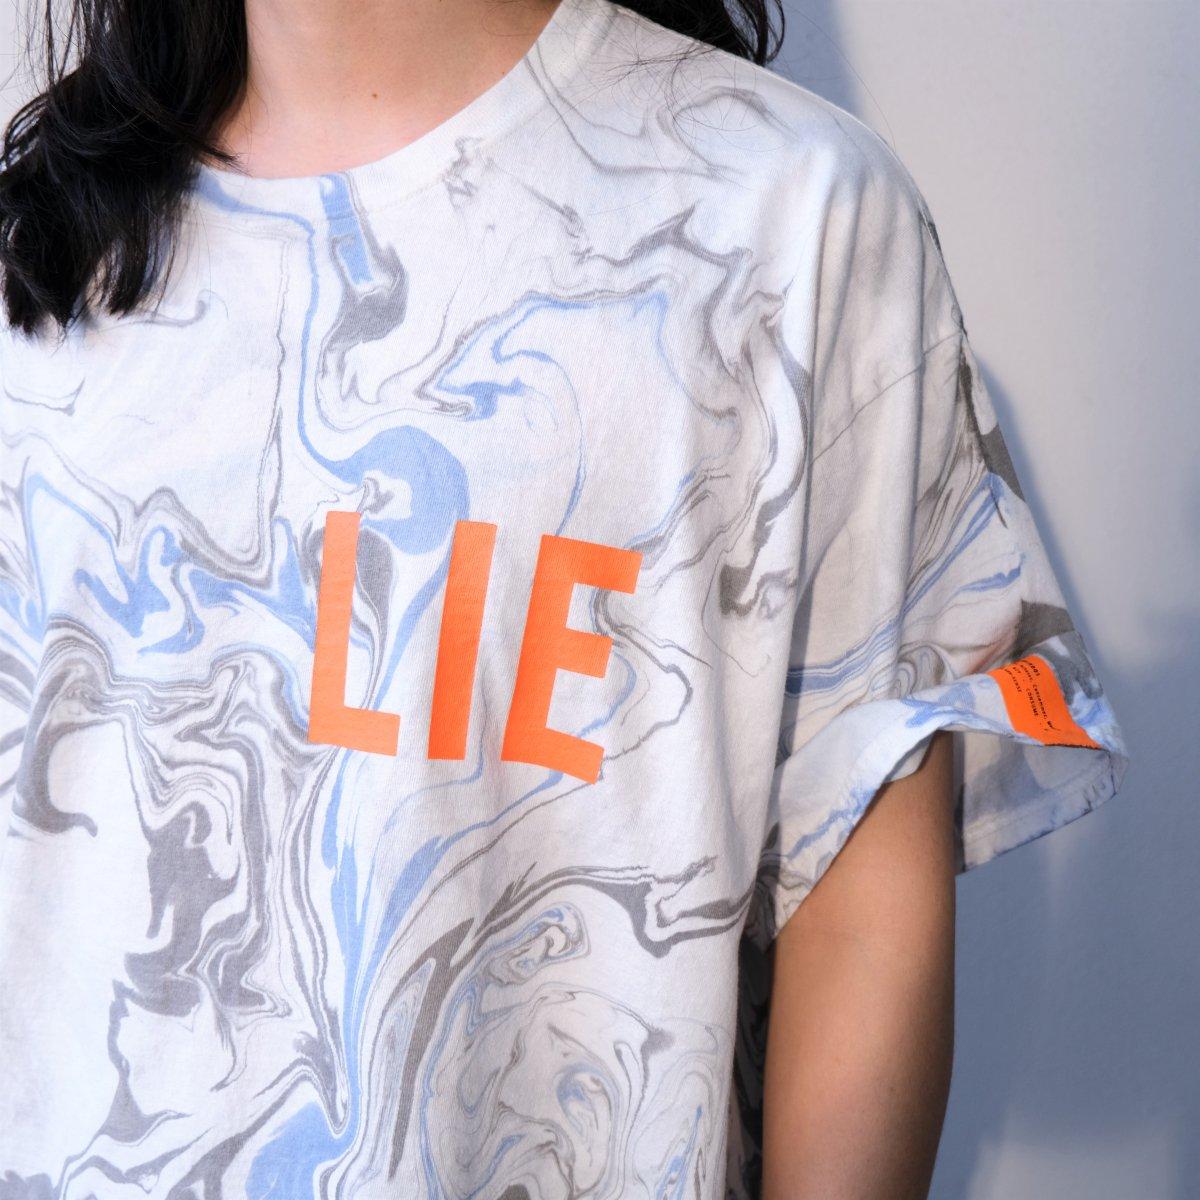 <img class='new_mark_img1' src='https://img.shop-pro.jp/img/new/icons3.gif' style='border:none;display:inline;margin:0px;padding:0px;width:auto;' />Black Weirdos  ブラック ウィドー / Tシャツ Marbling TieDye Tee 【BLUE】